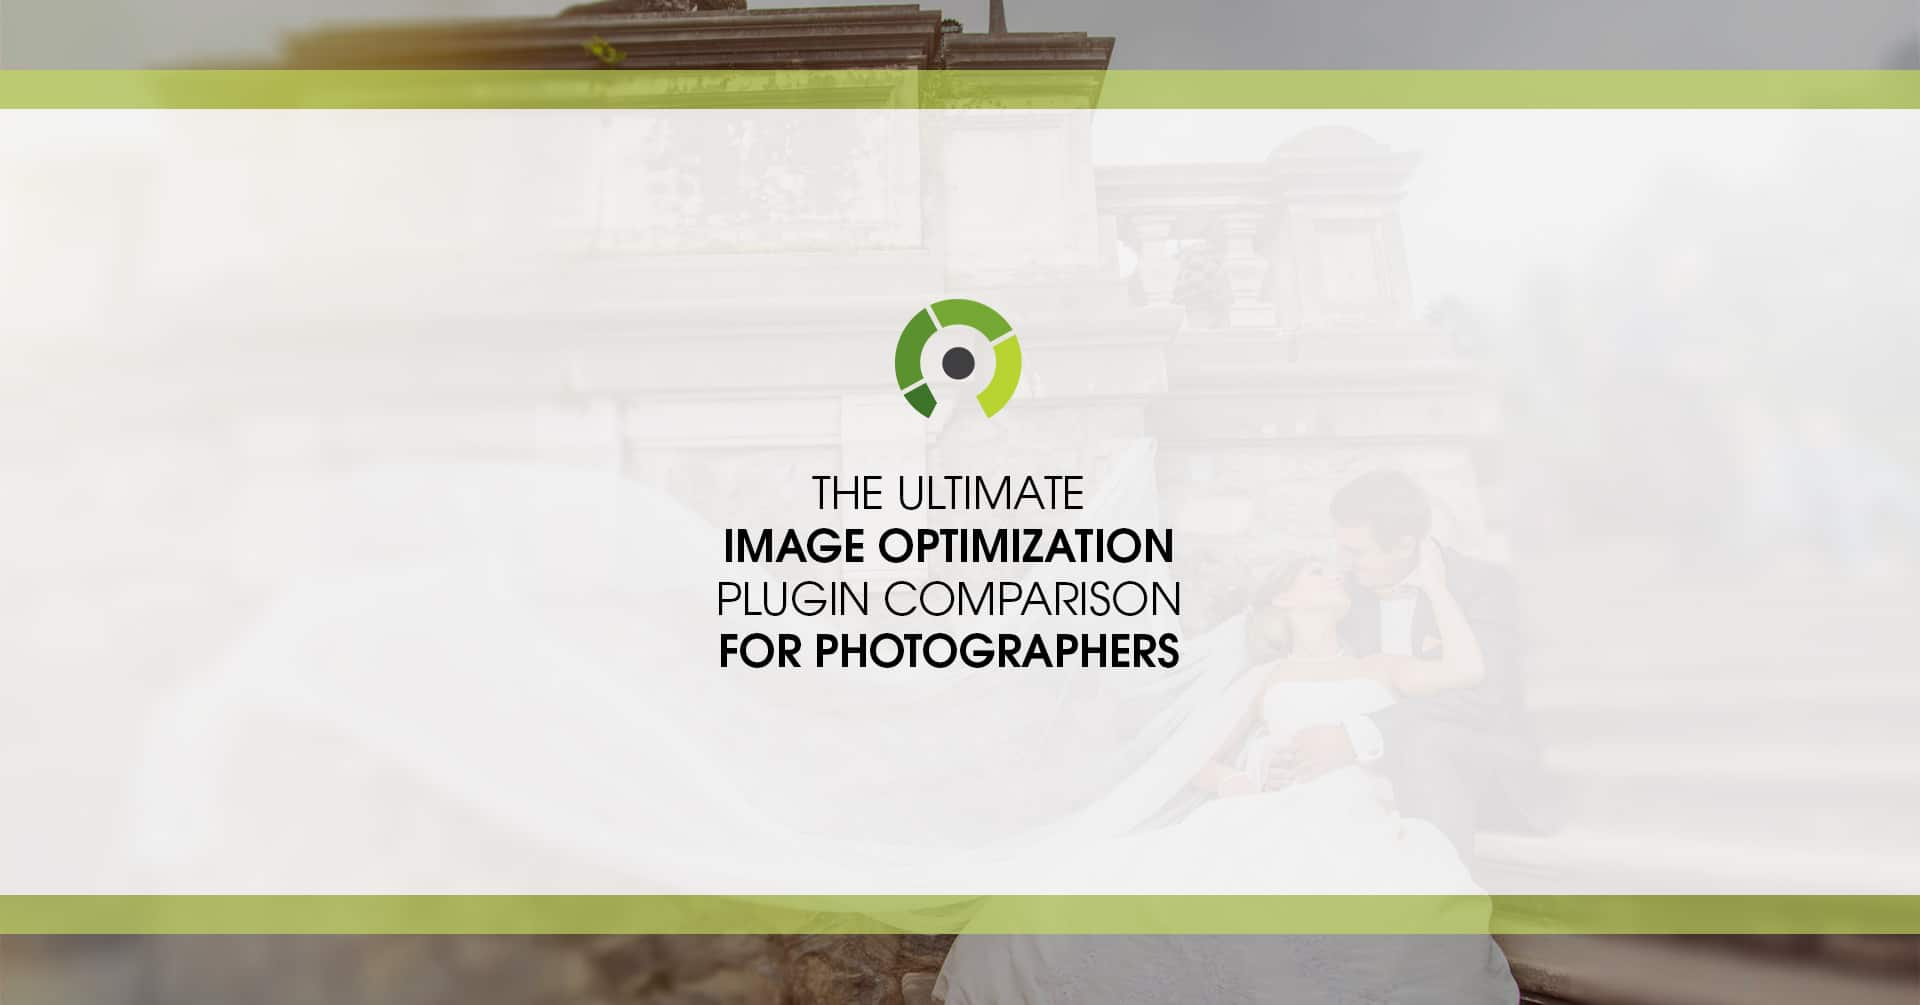 The Ultimate Image Optimization Plugin Comparison for